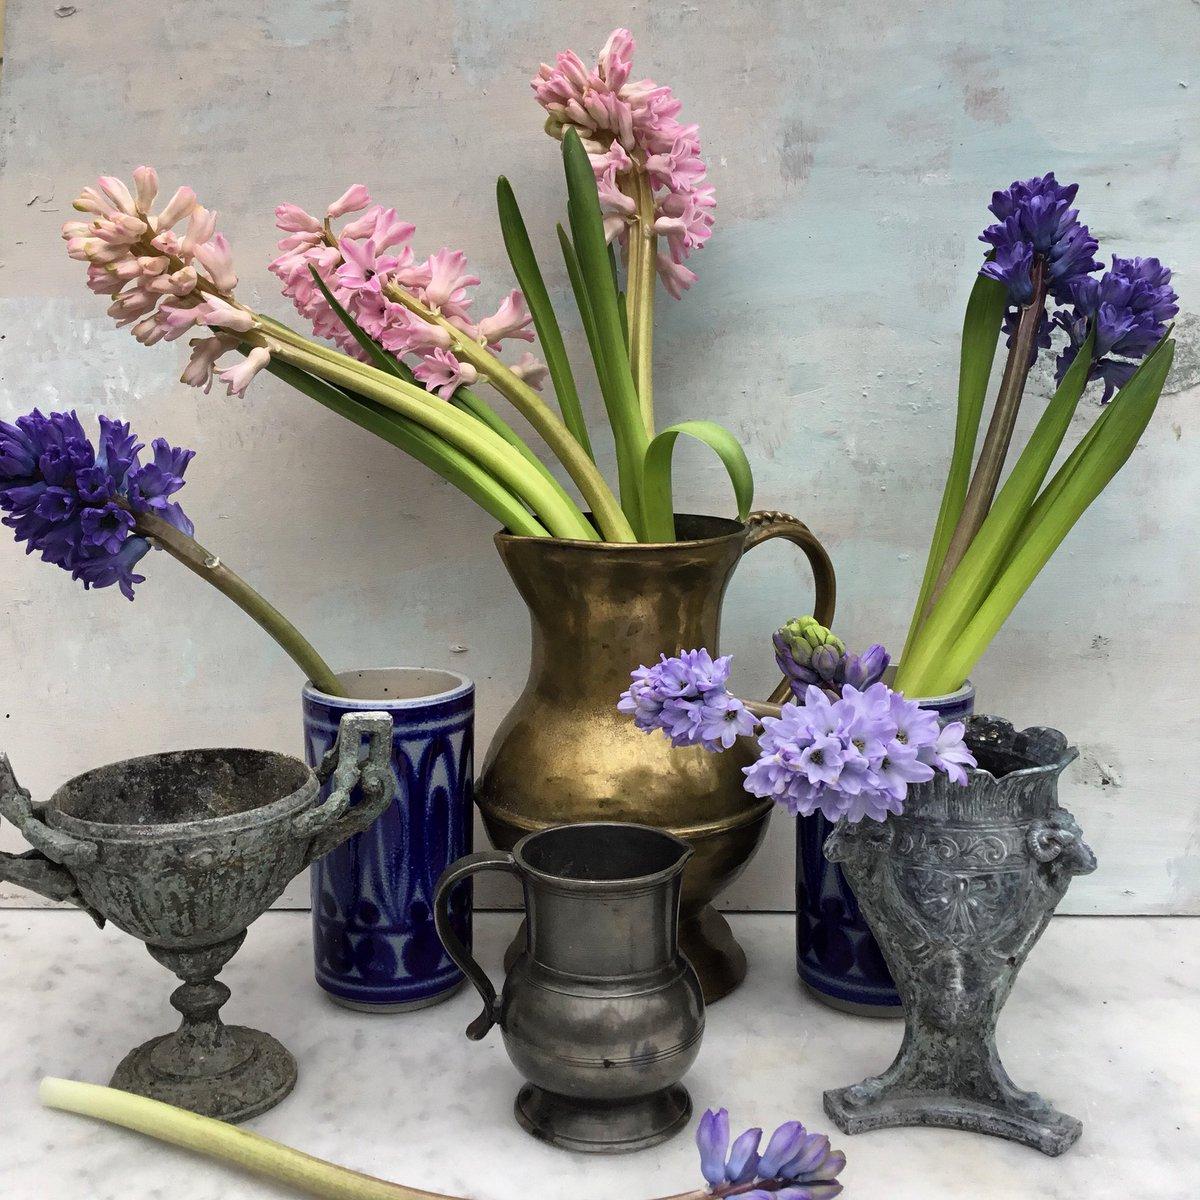 RT @GardenBrocante: Hyacinths and cool metal. #antiques https://t.co/AhsaDMicqU